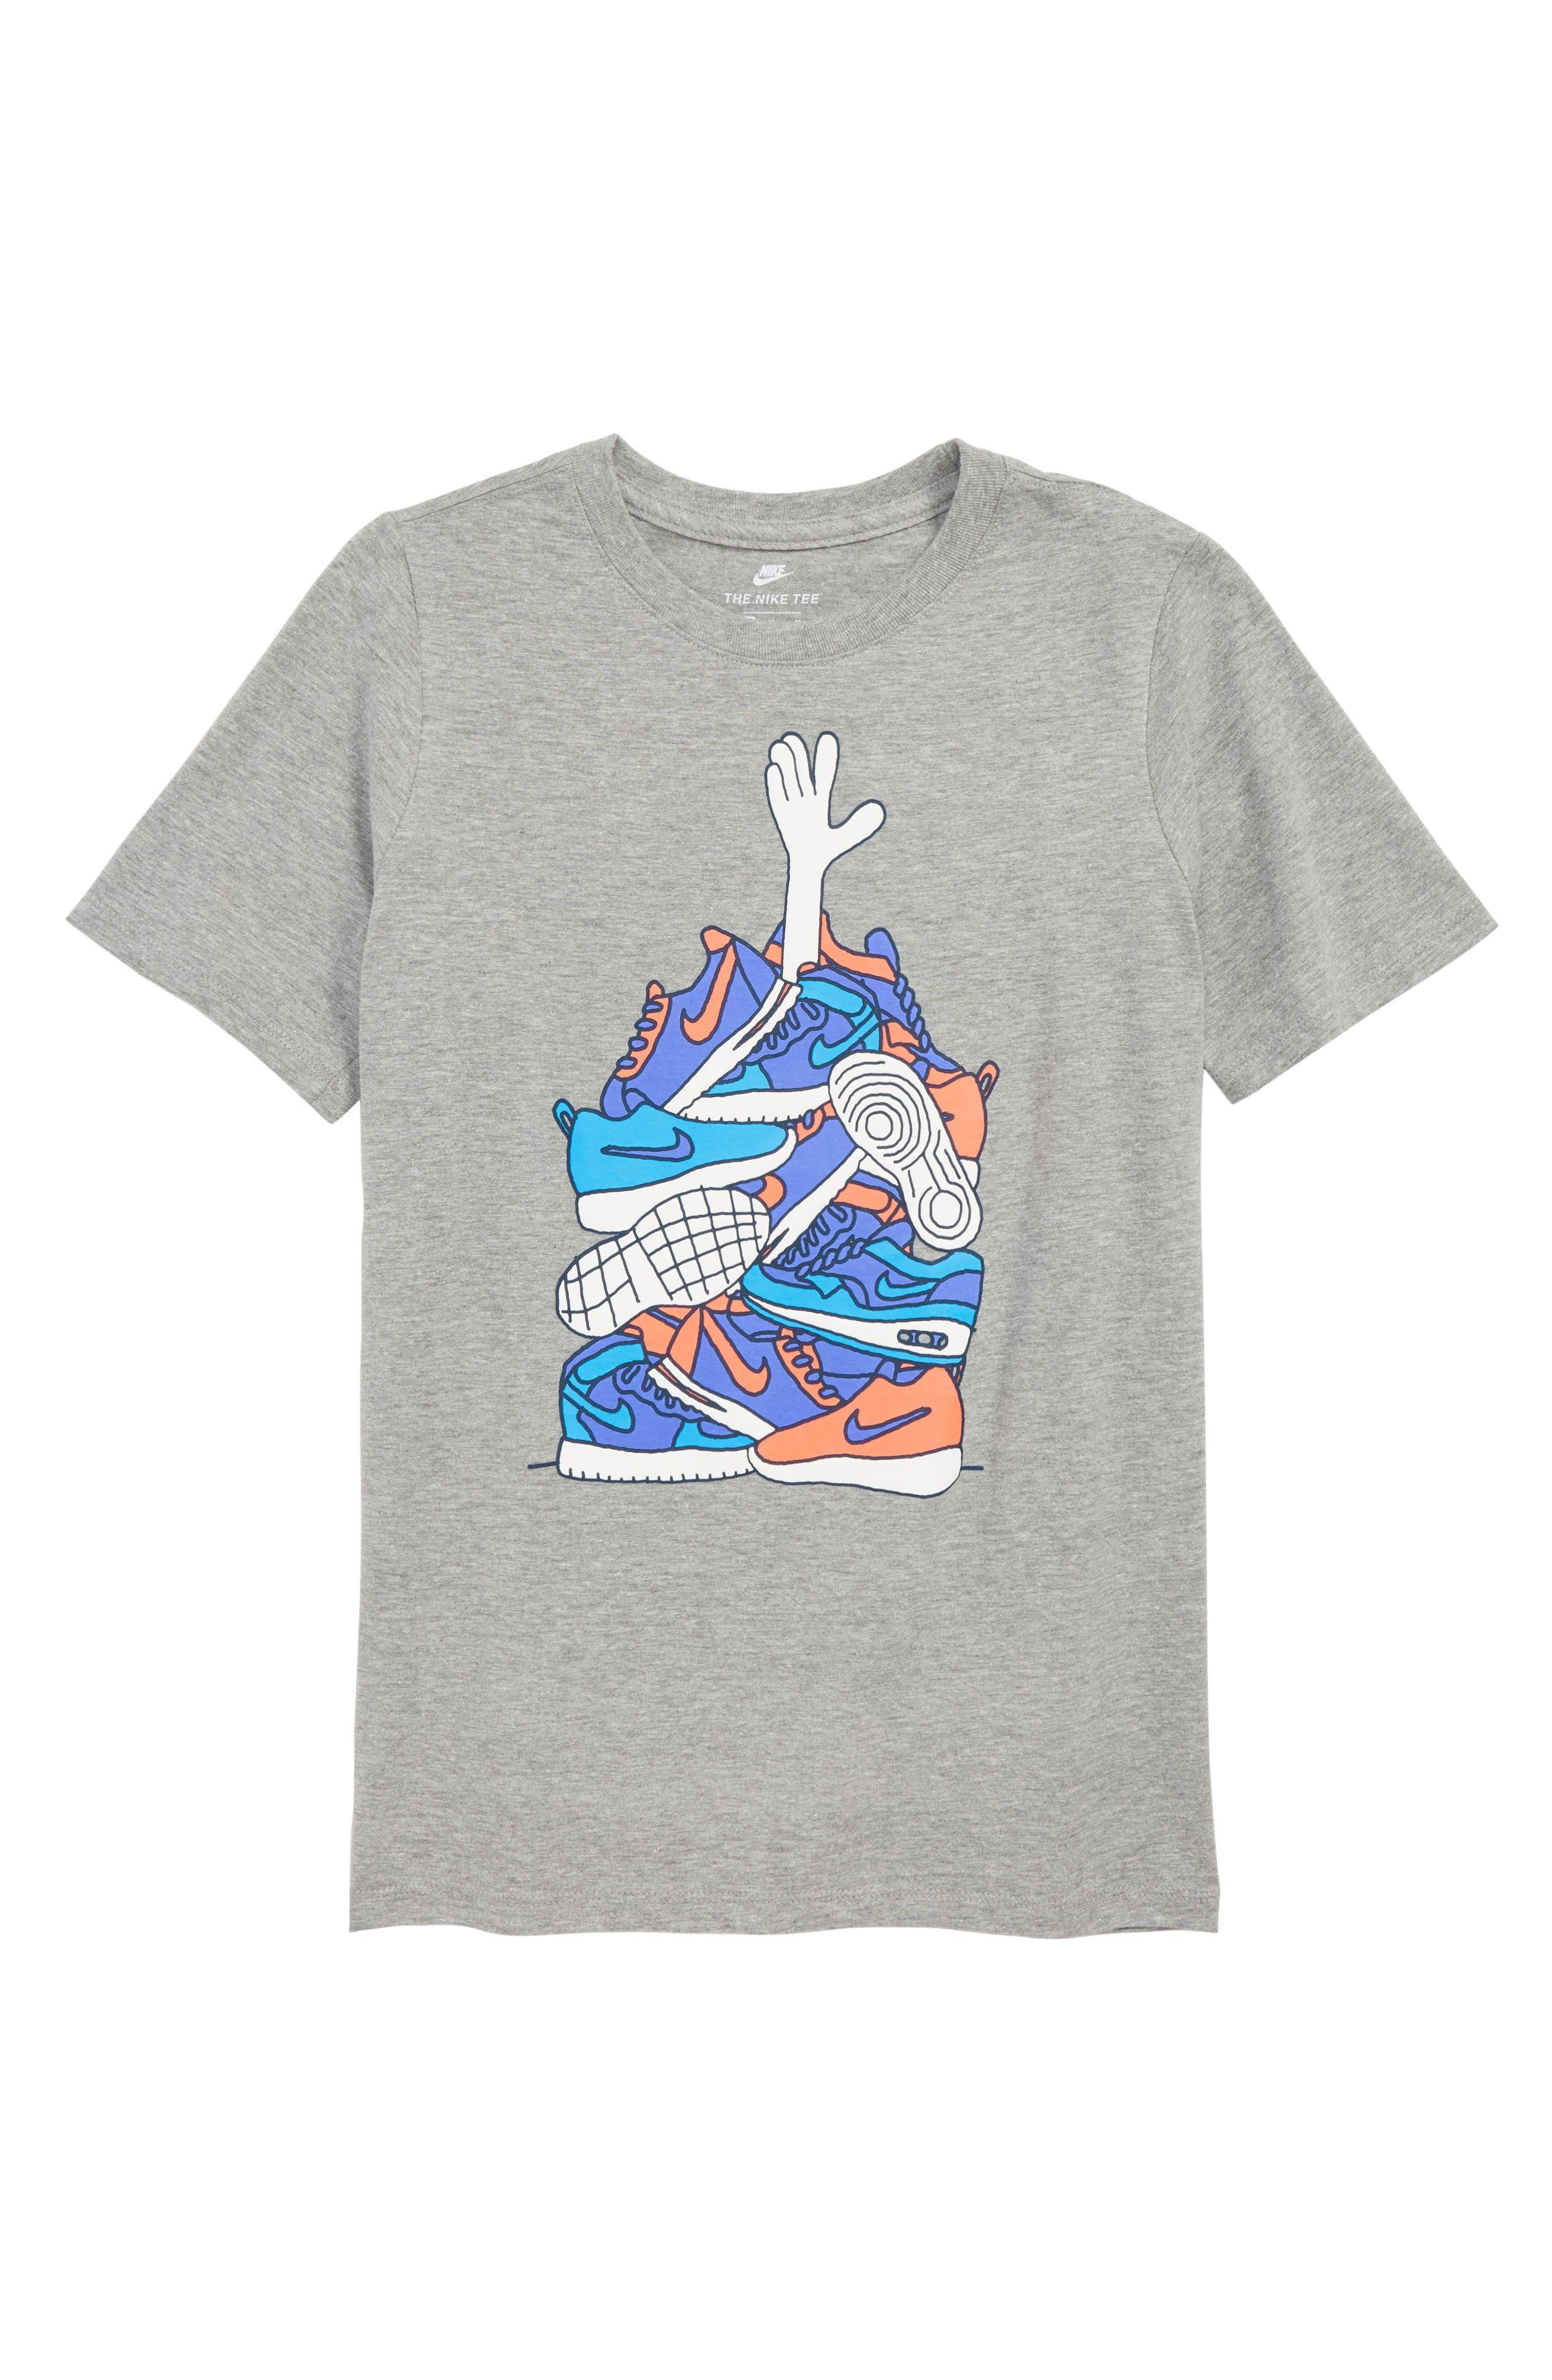 Sneaker Pile Graphic T-Shirt,                             Main thumbnail 1, color,                             063